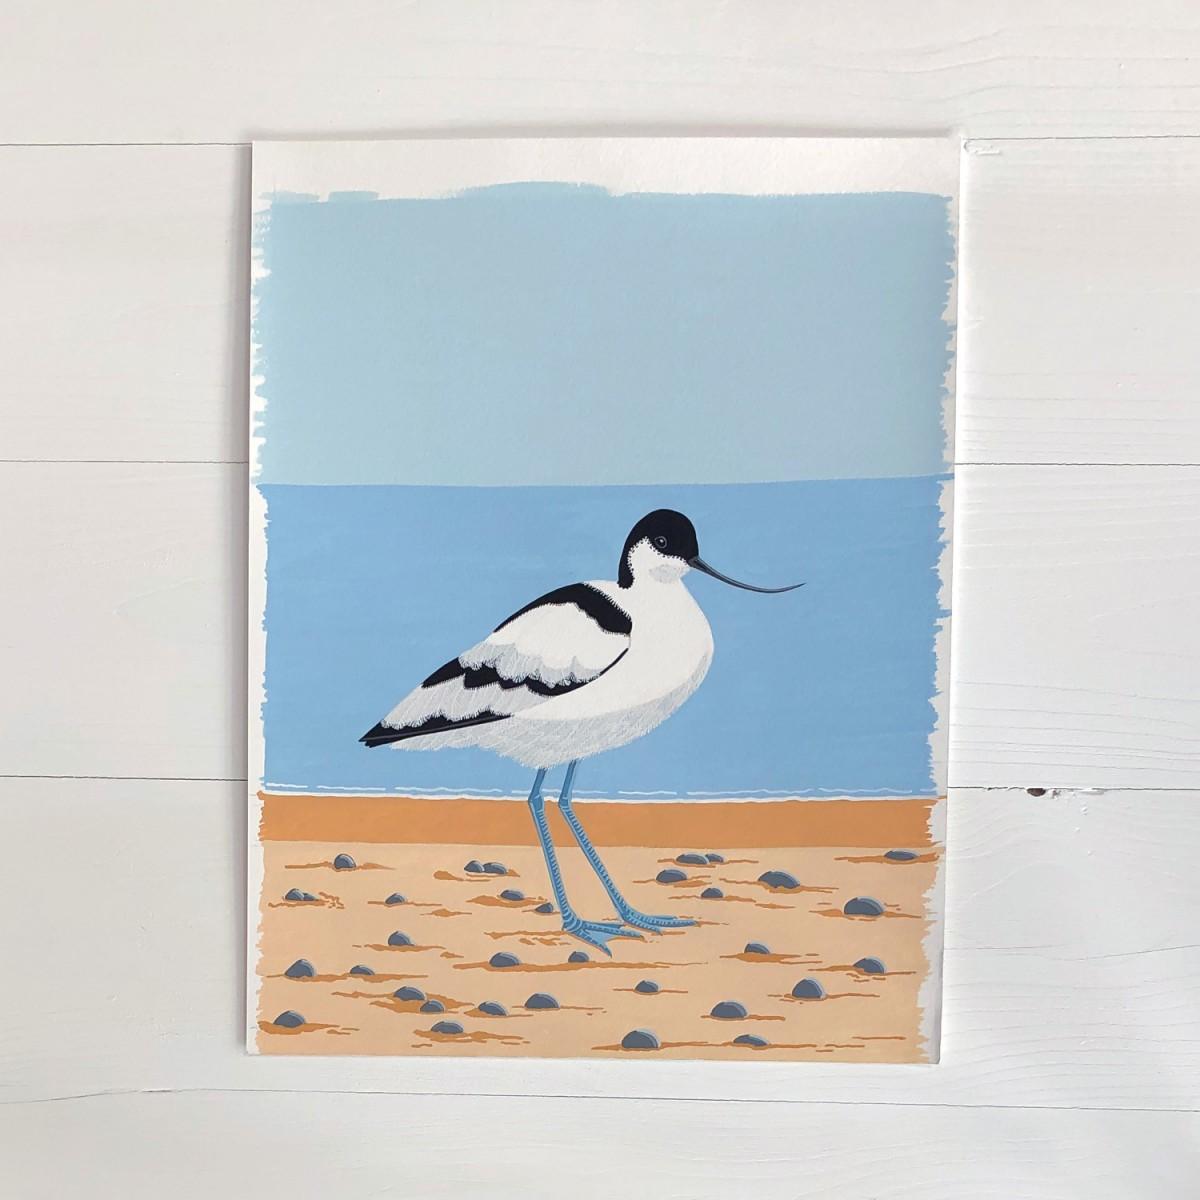 Avocet Sea Bird Original Gouache Painting By Bird The Artist